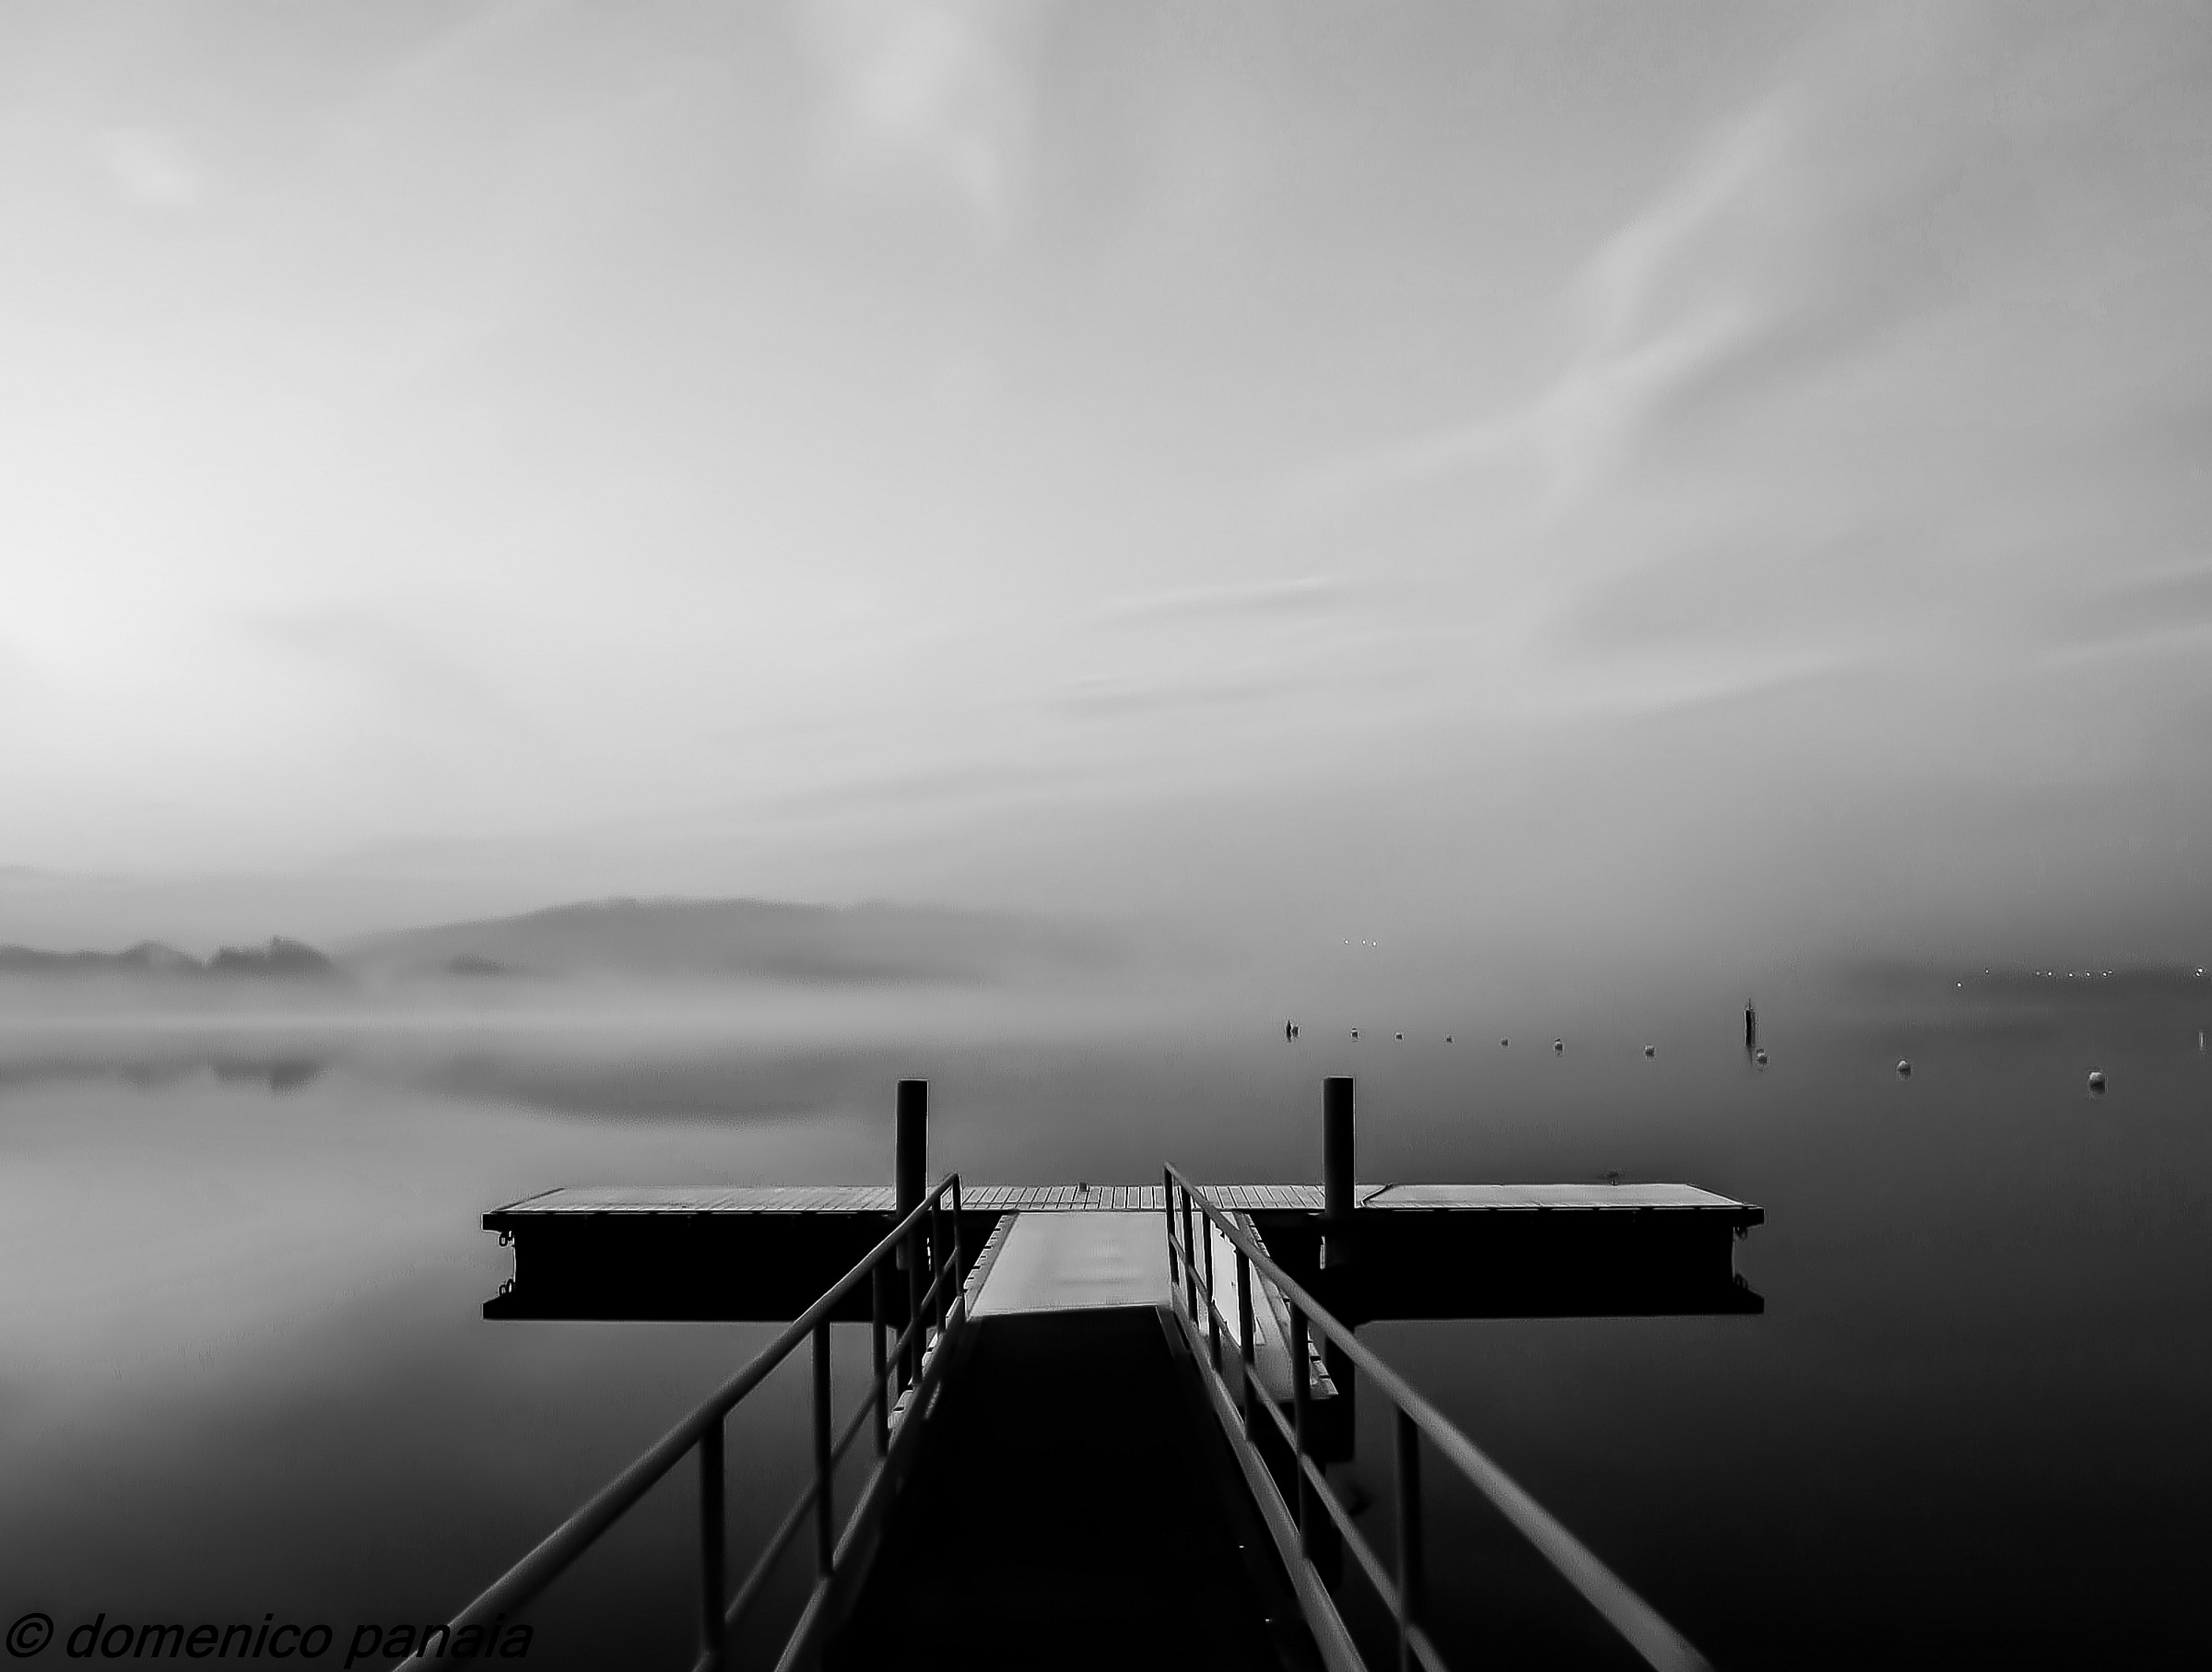 lago di varese...